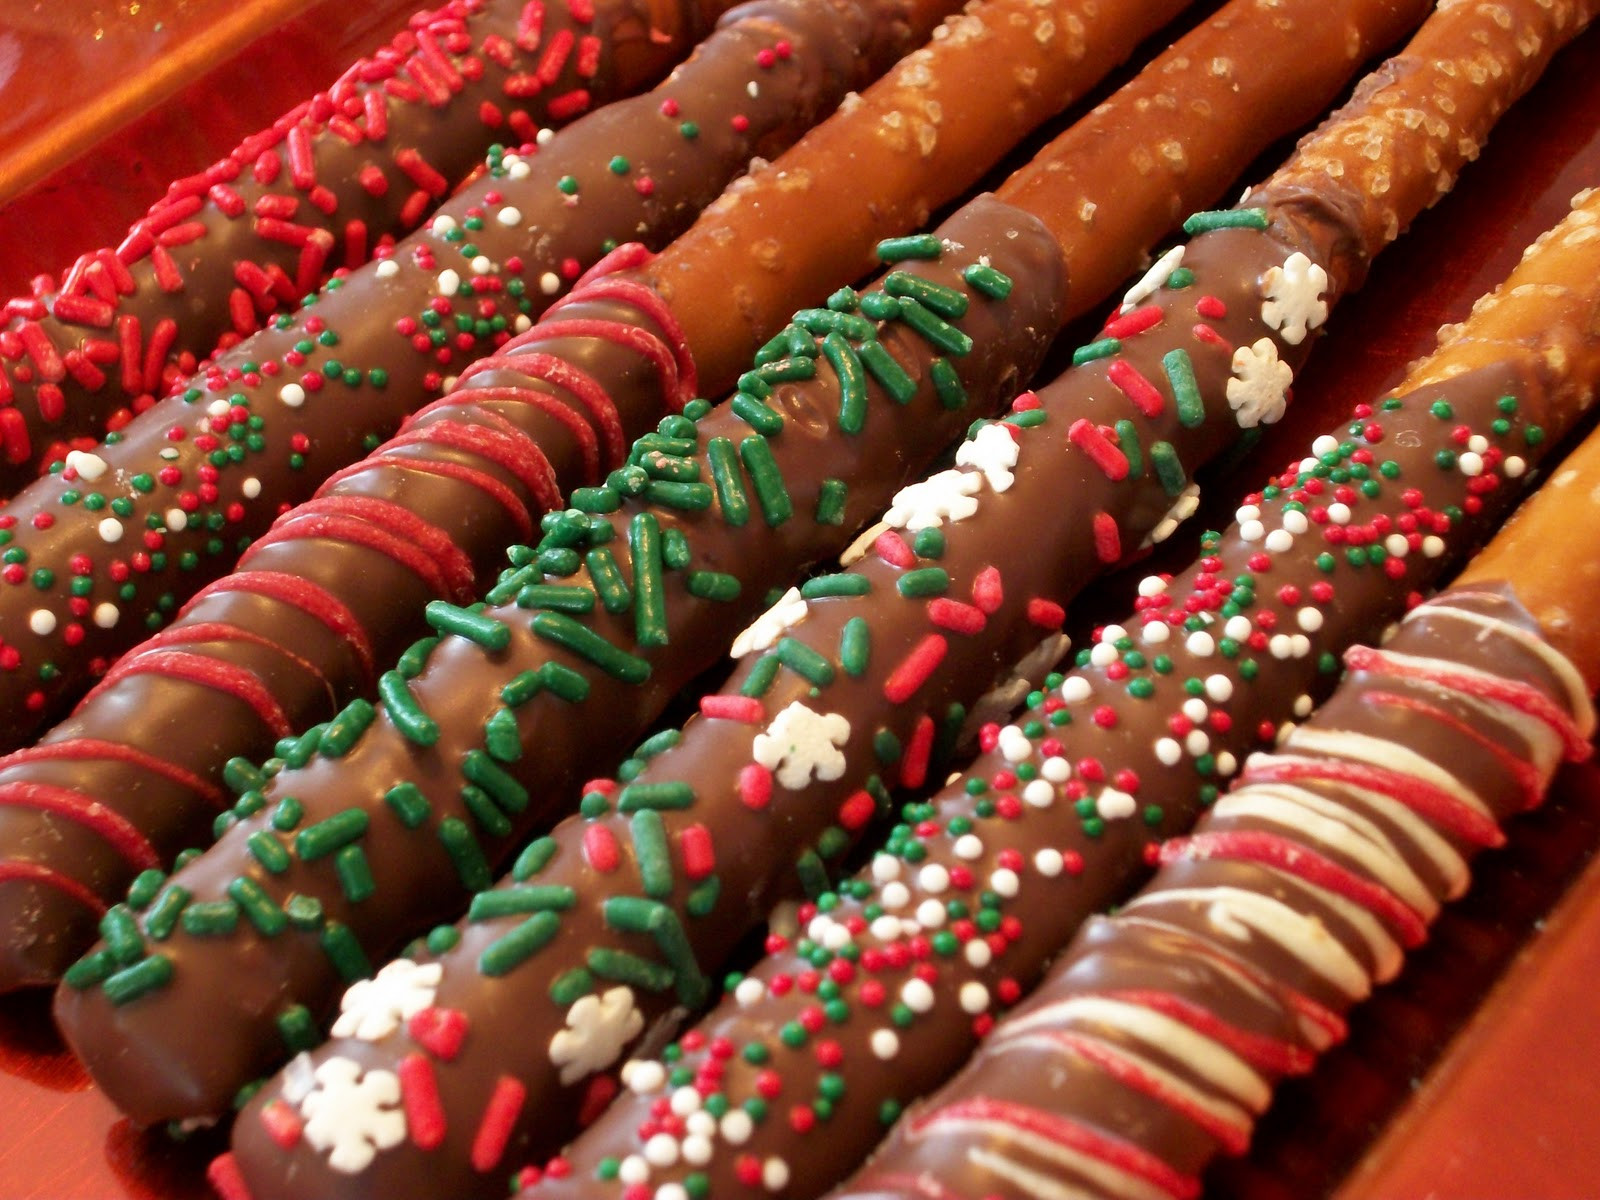 Christmas Dipped Pretzels  Lola Pearl Bake Shoppe December 2011